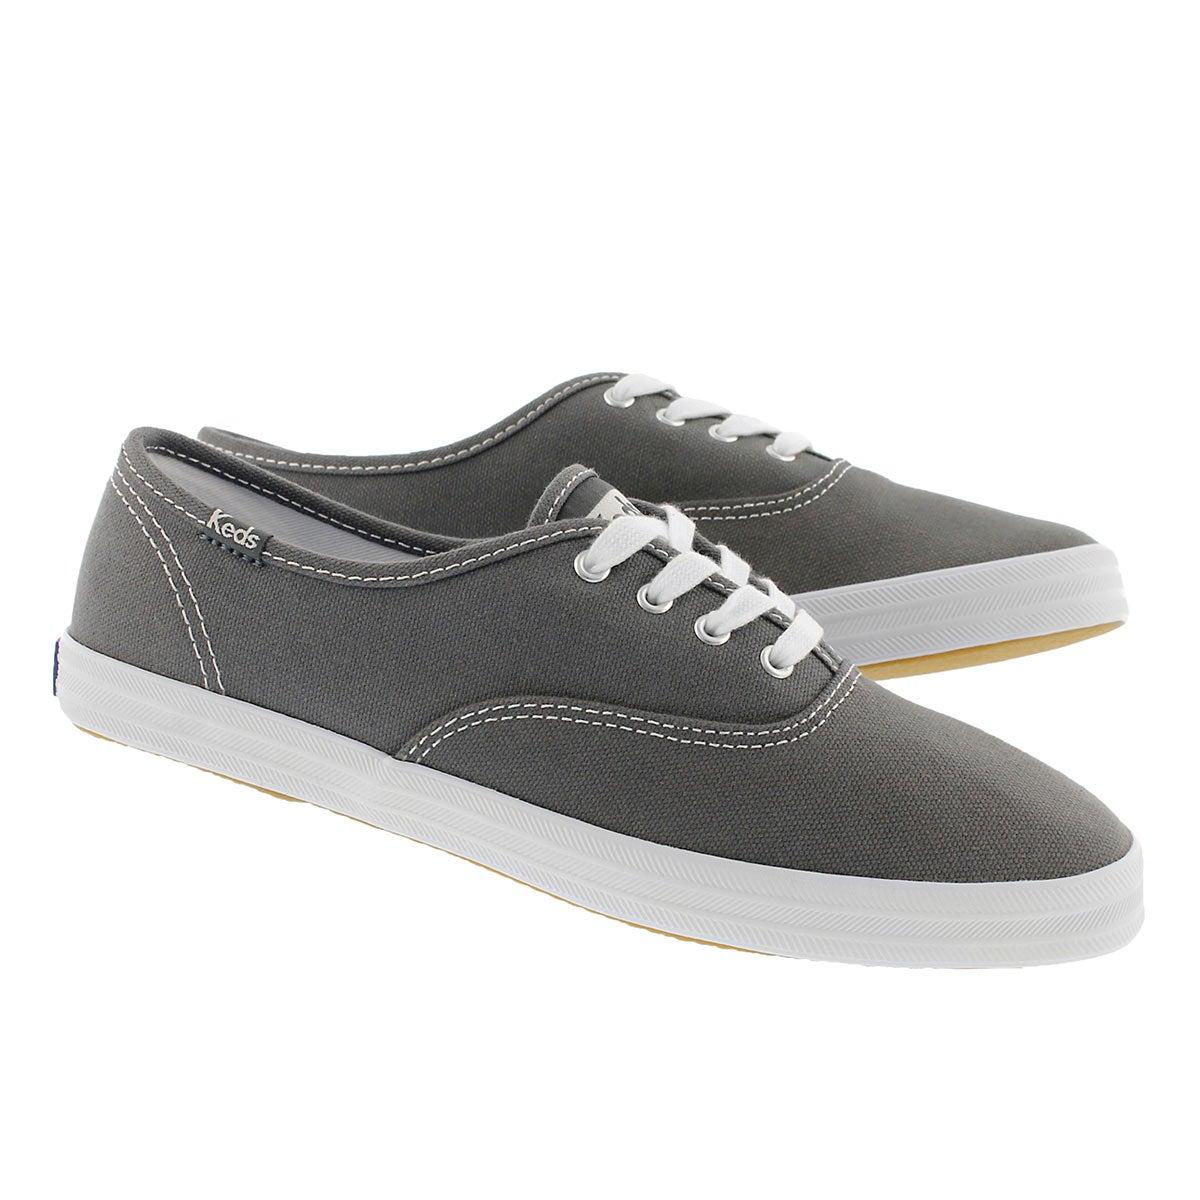 Lds Champion grey canvas CVO sneaker